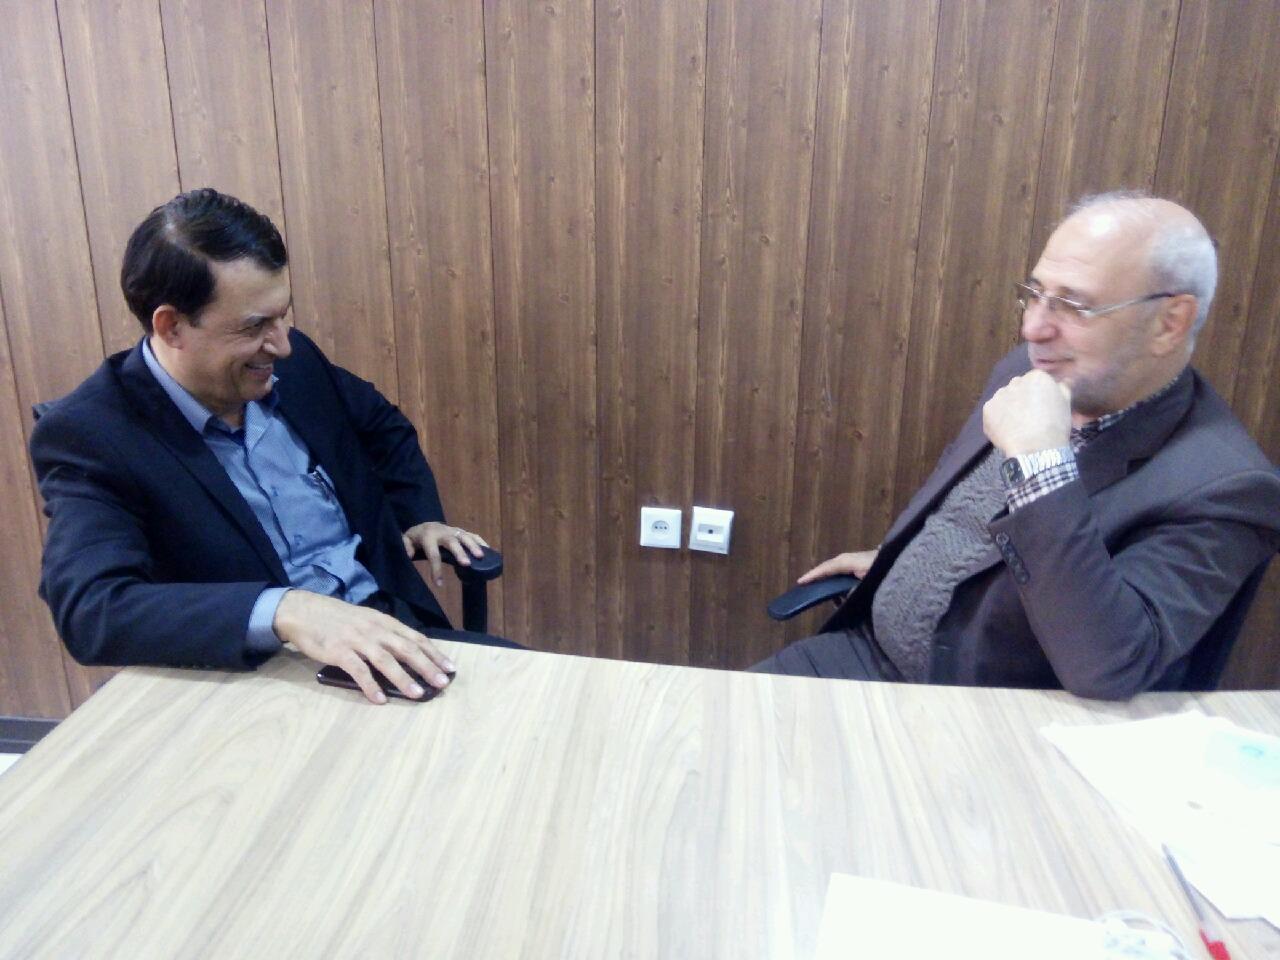 ❇️حاجی خطاب به رئیس جدید بیمارستان گلدیس شاهین شهر: